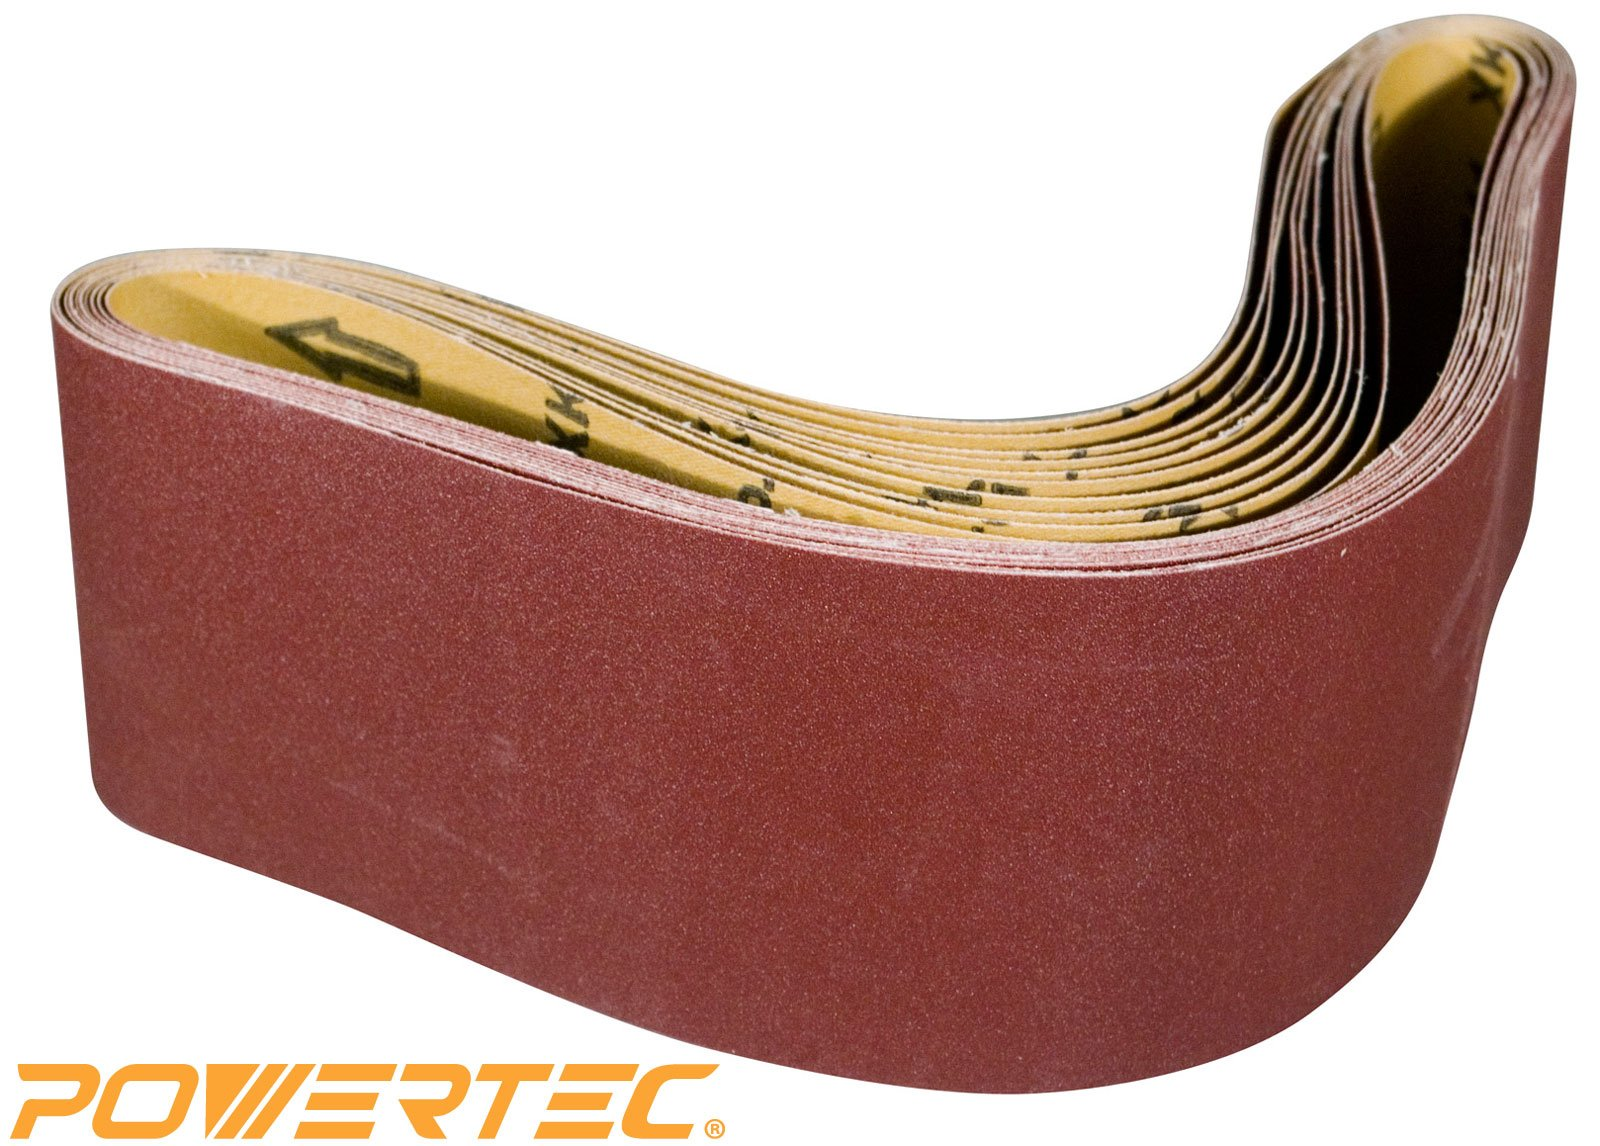 POWERTEC 110180 6-Inch x 48-Inch 100 Grit Aluminum Oxide Sanding Belt, 10-Pack